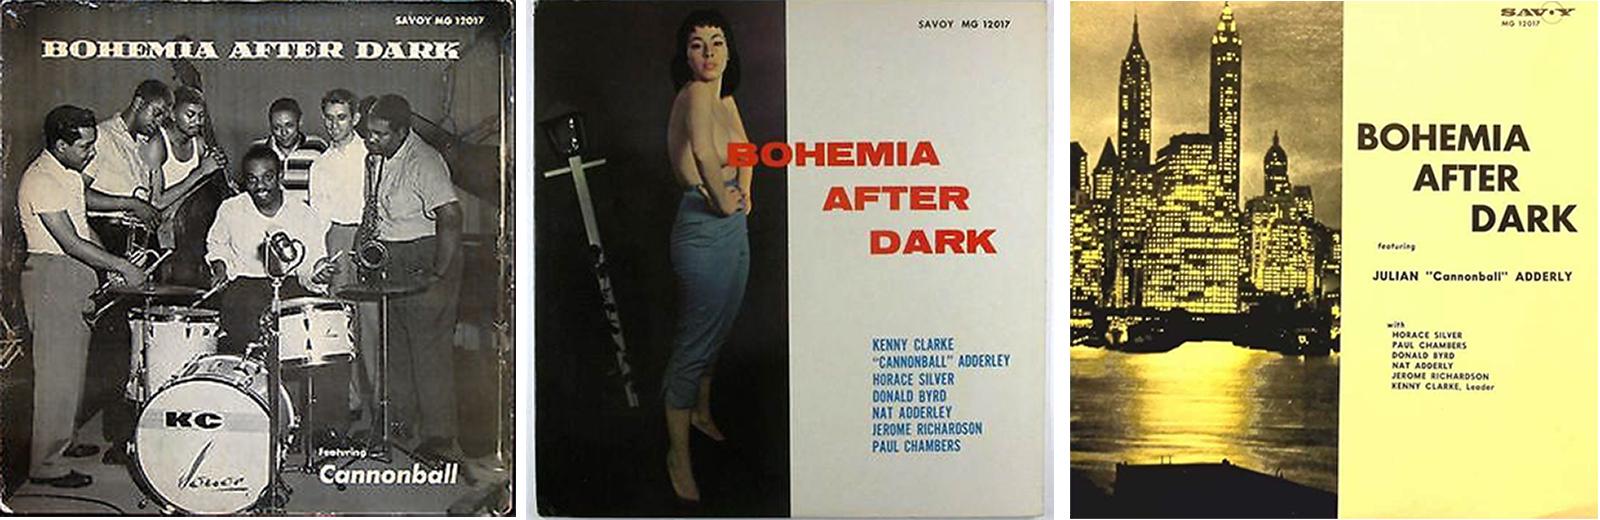 bohemia-after-dark-alt-covers.jpg